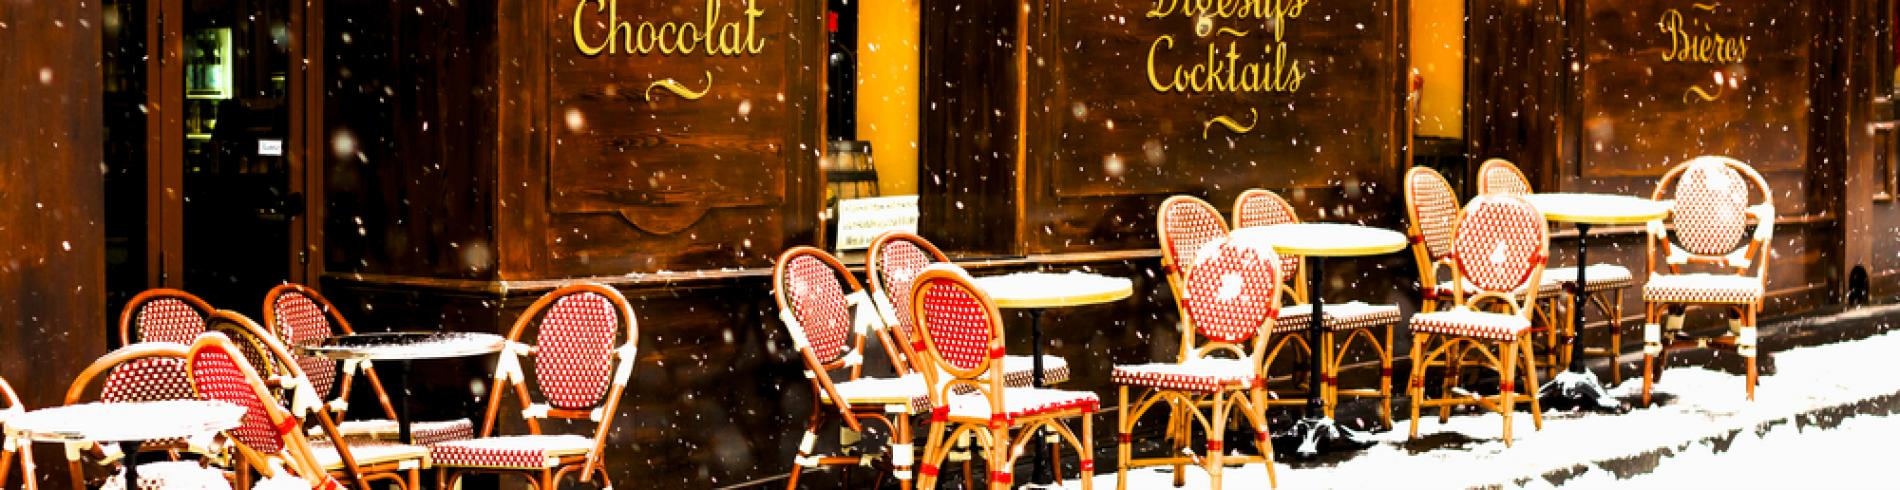 Brasserie in Paris